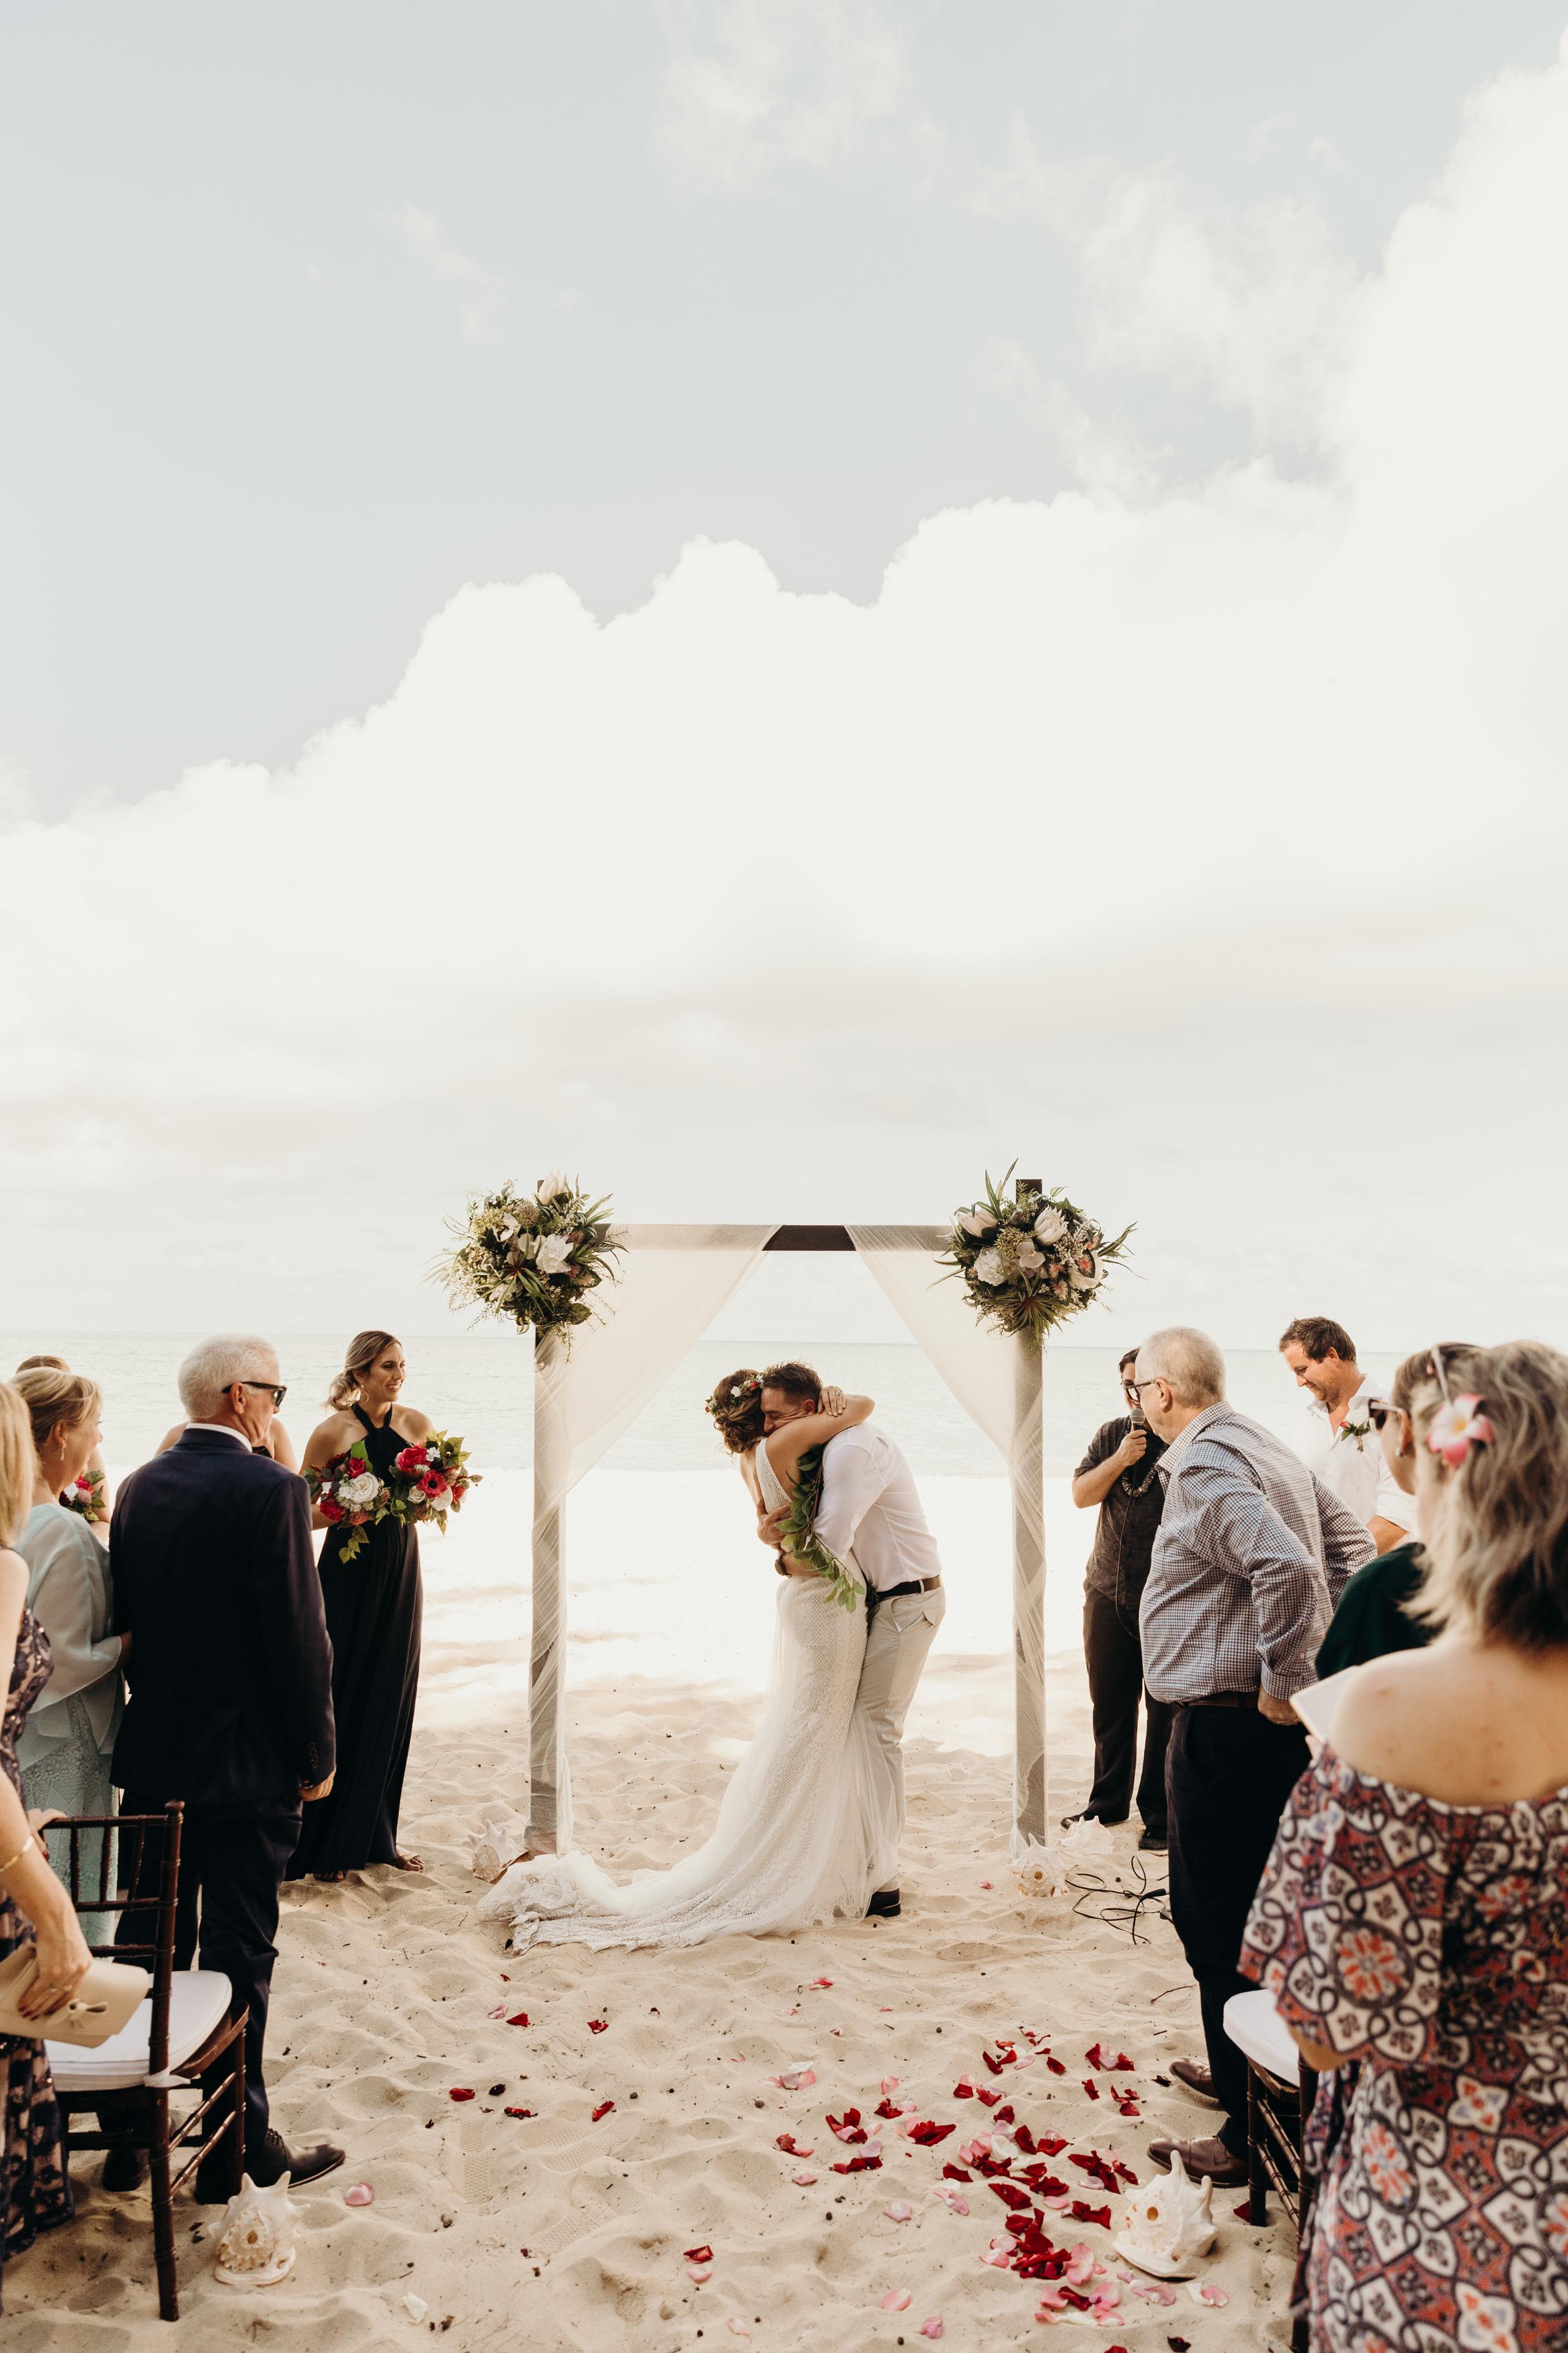 HAWAII-WEDDING-PHOTOGRAPHER-ALOHILANI-RESORT-KEANI-BAKULA-37.jpg